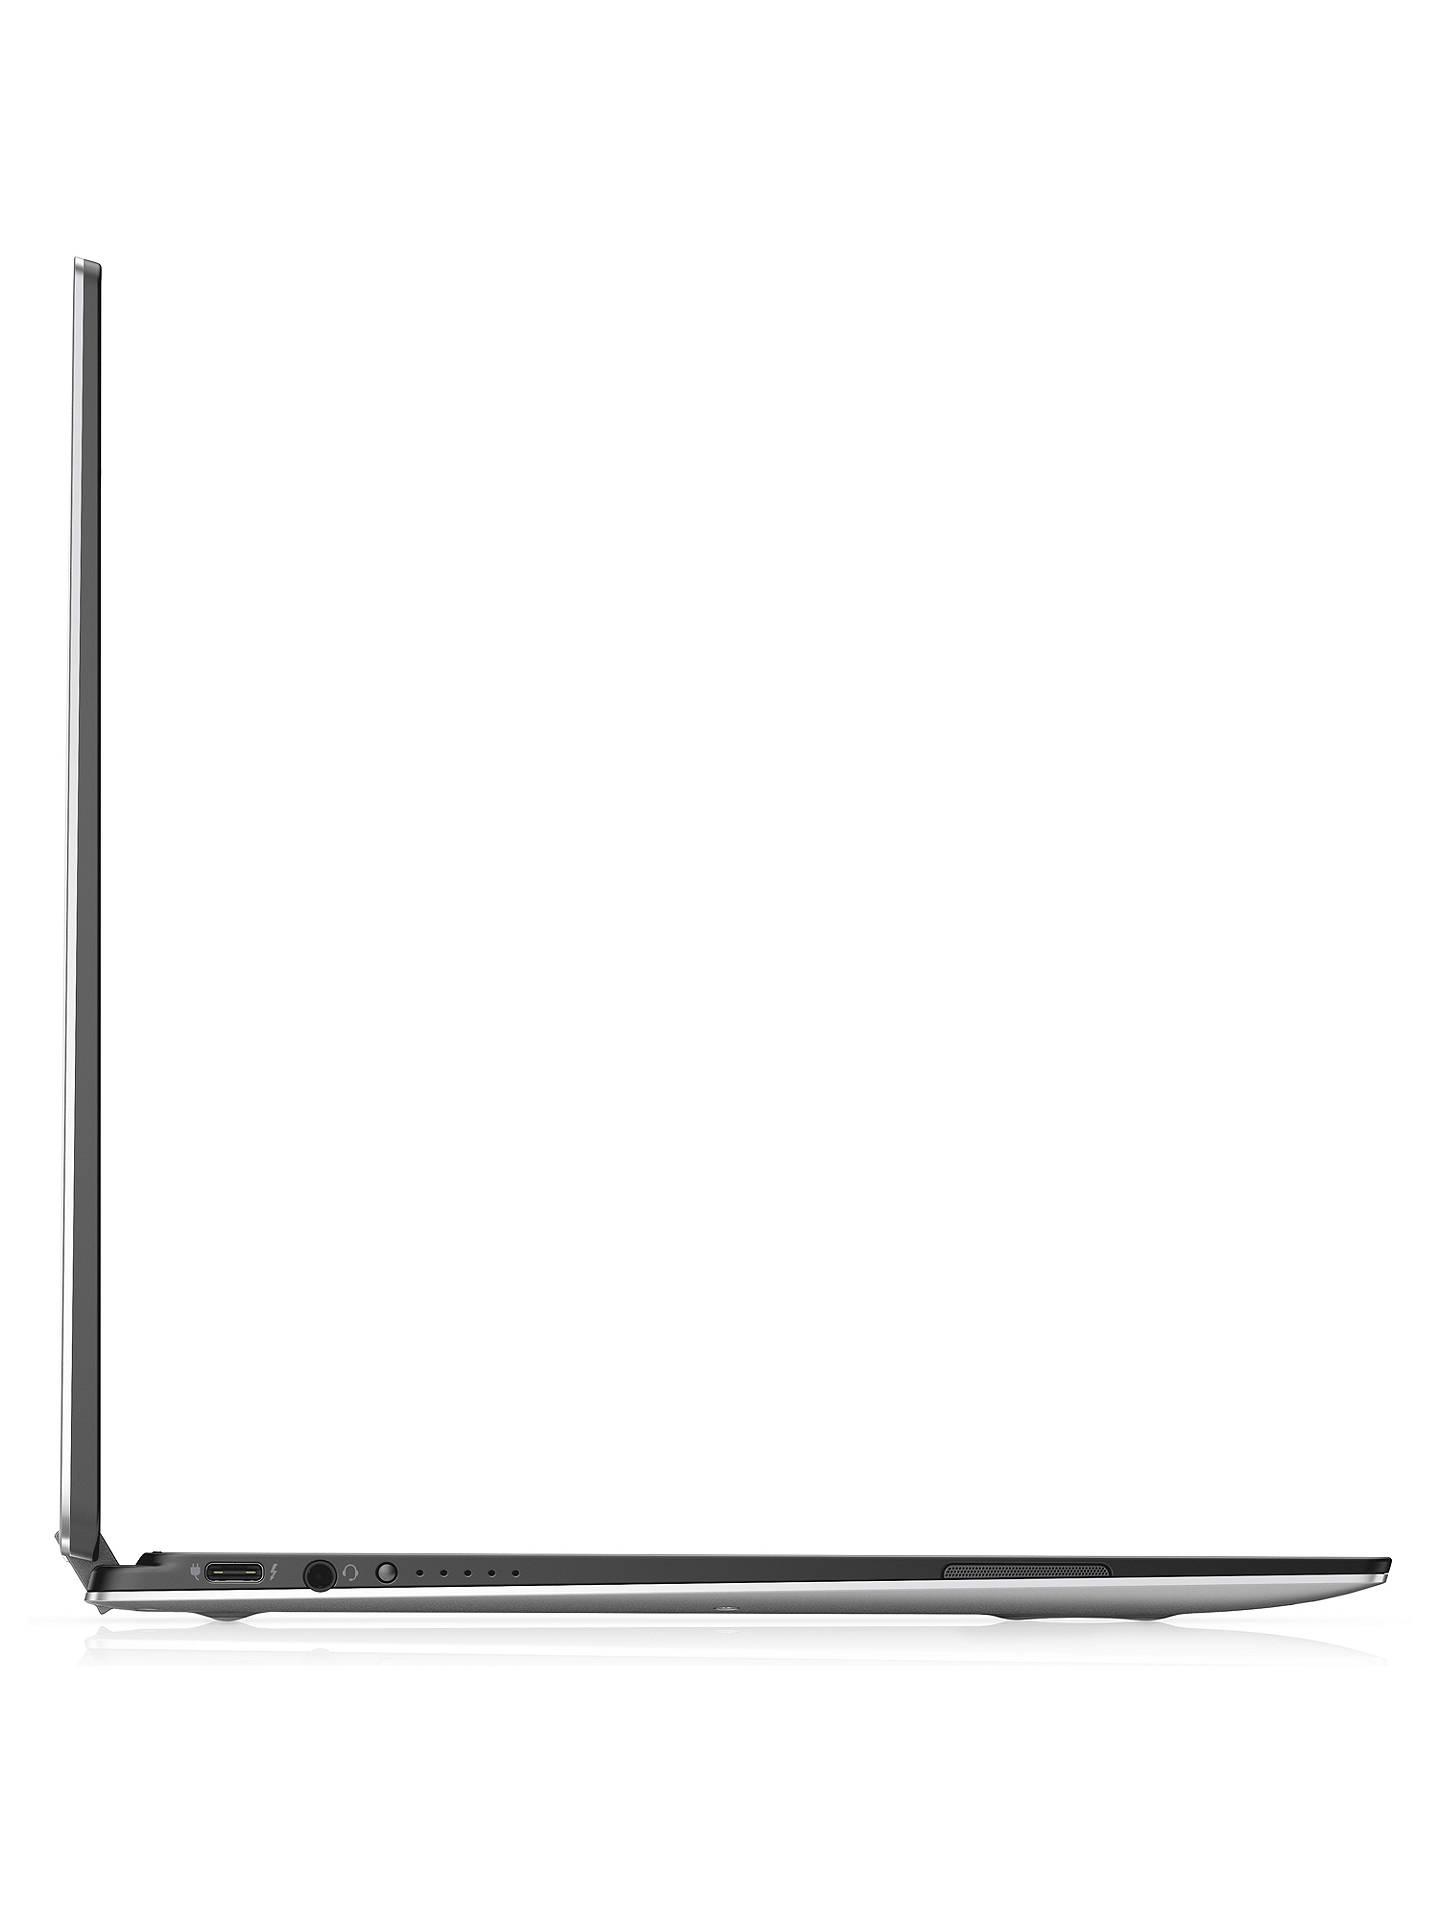 Dell XPS 13 Laptop, Intel Core i7, 16GB RAM, 256GB SSD, 13